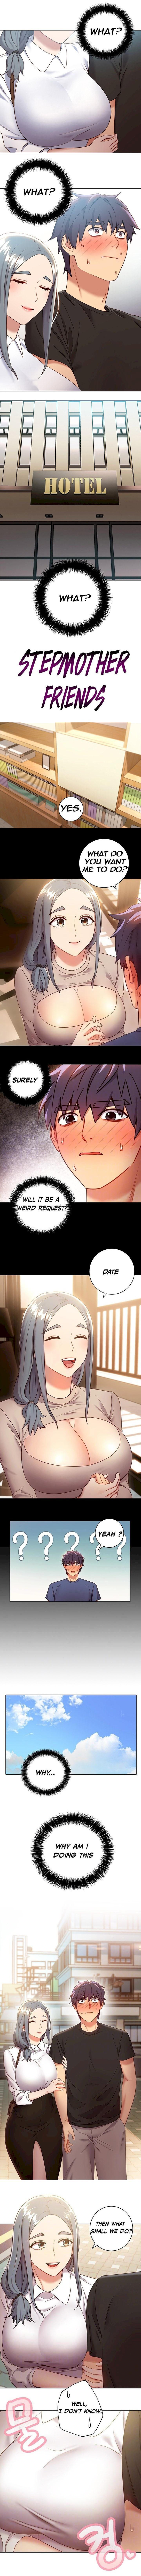 [Neck Pilllow] Stepmother Friends Ch.40/? [English] [Hentai Universe] NEW! 22/10/2020 197